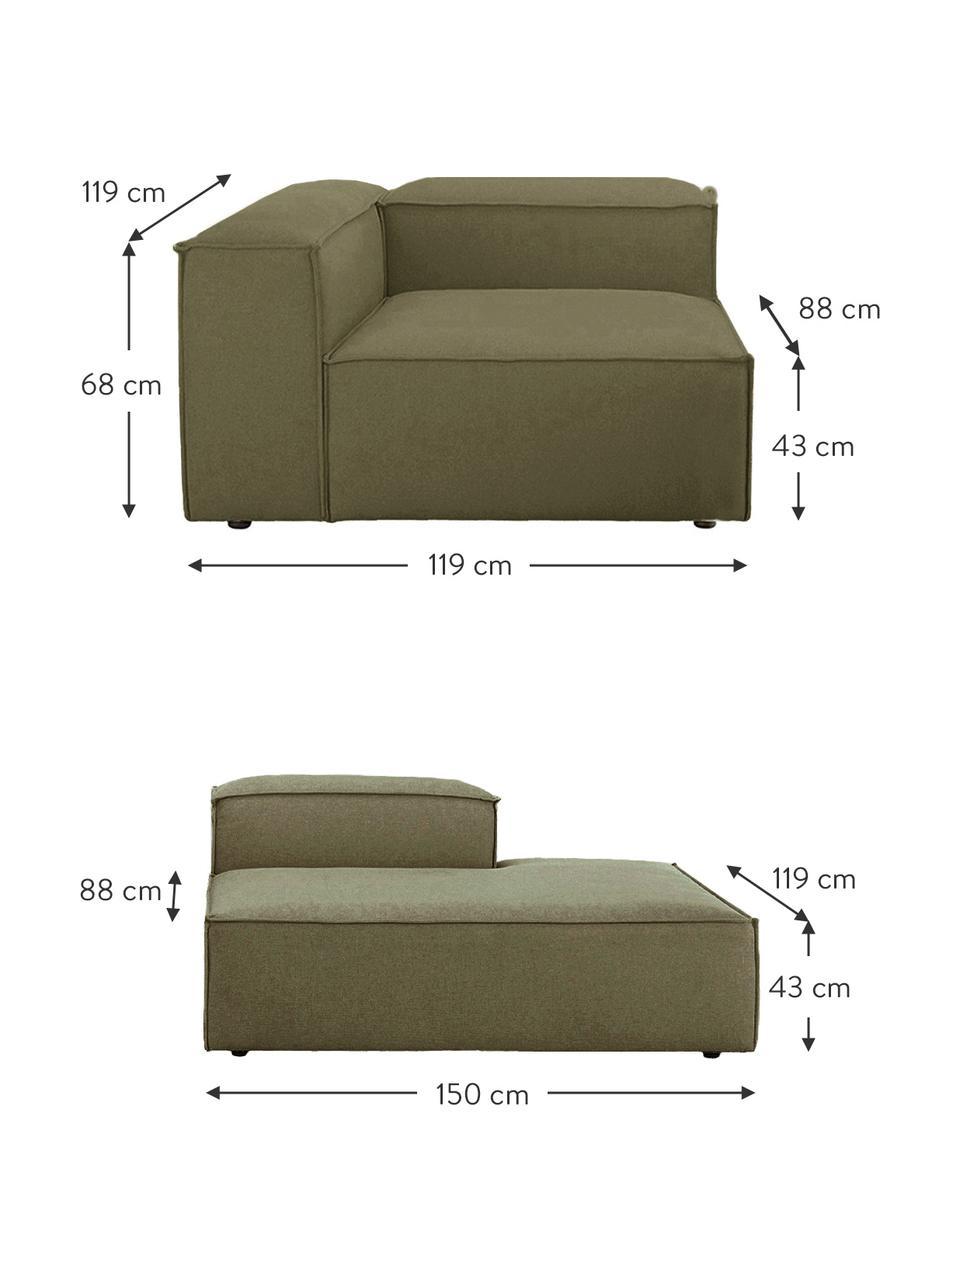 Modulaire chaise longue Lennon in groen, Bekleding: polyester De hoogwaardige, Frame: massief grenenhout, multi, Poten: kunststof De poten bevind, Geweven stof groen, B 269 x D 119 cm